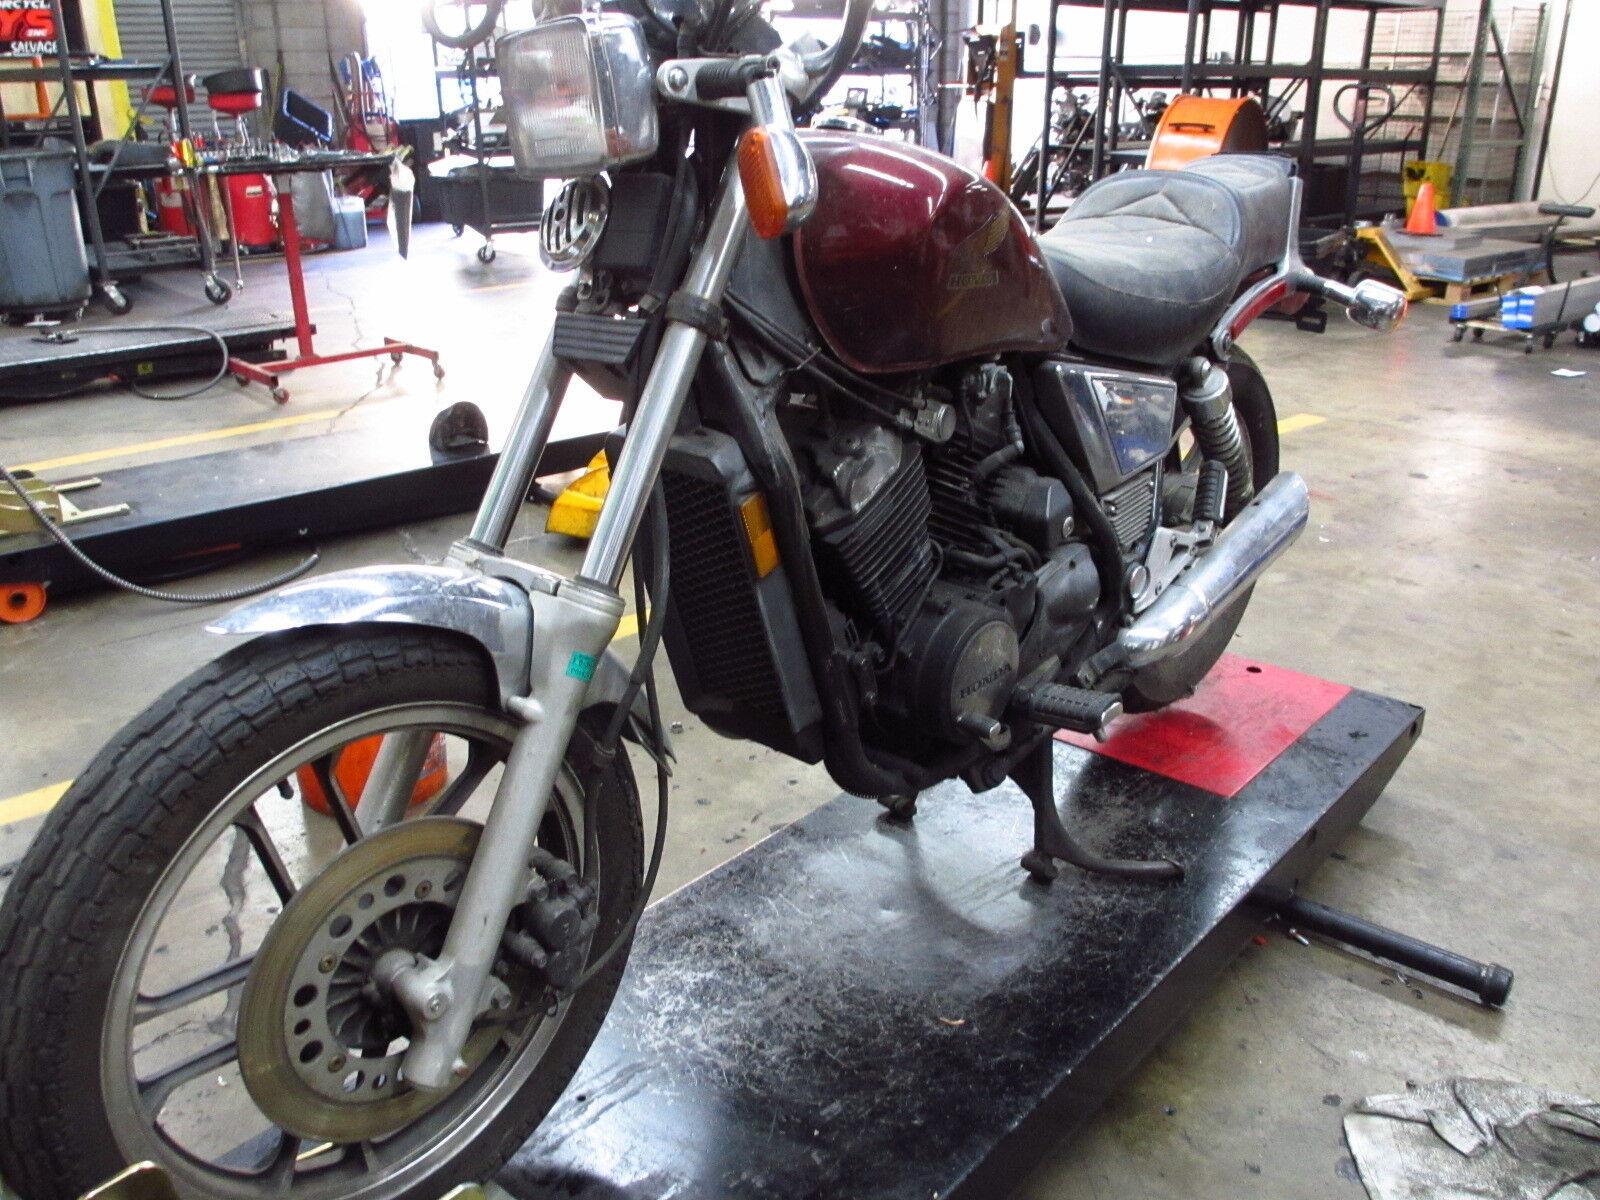 1983 83 84 Honda Shadow 500 Vt500c Oil Pressure Sensor Oem Works For Motorcycle Parts Sale